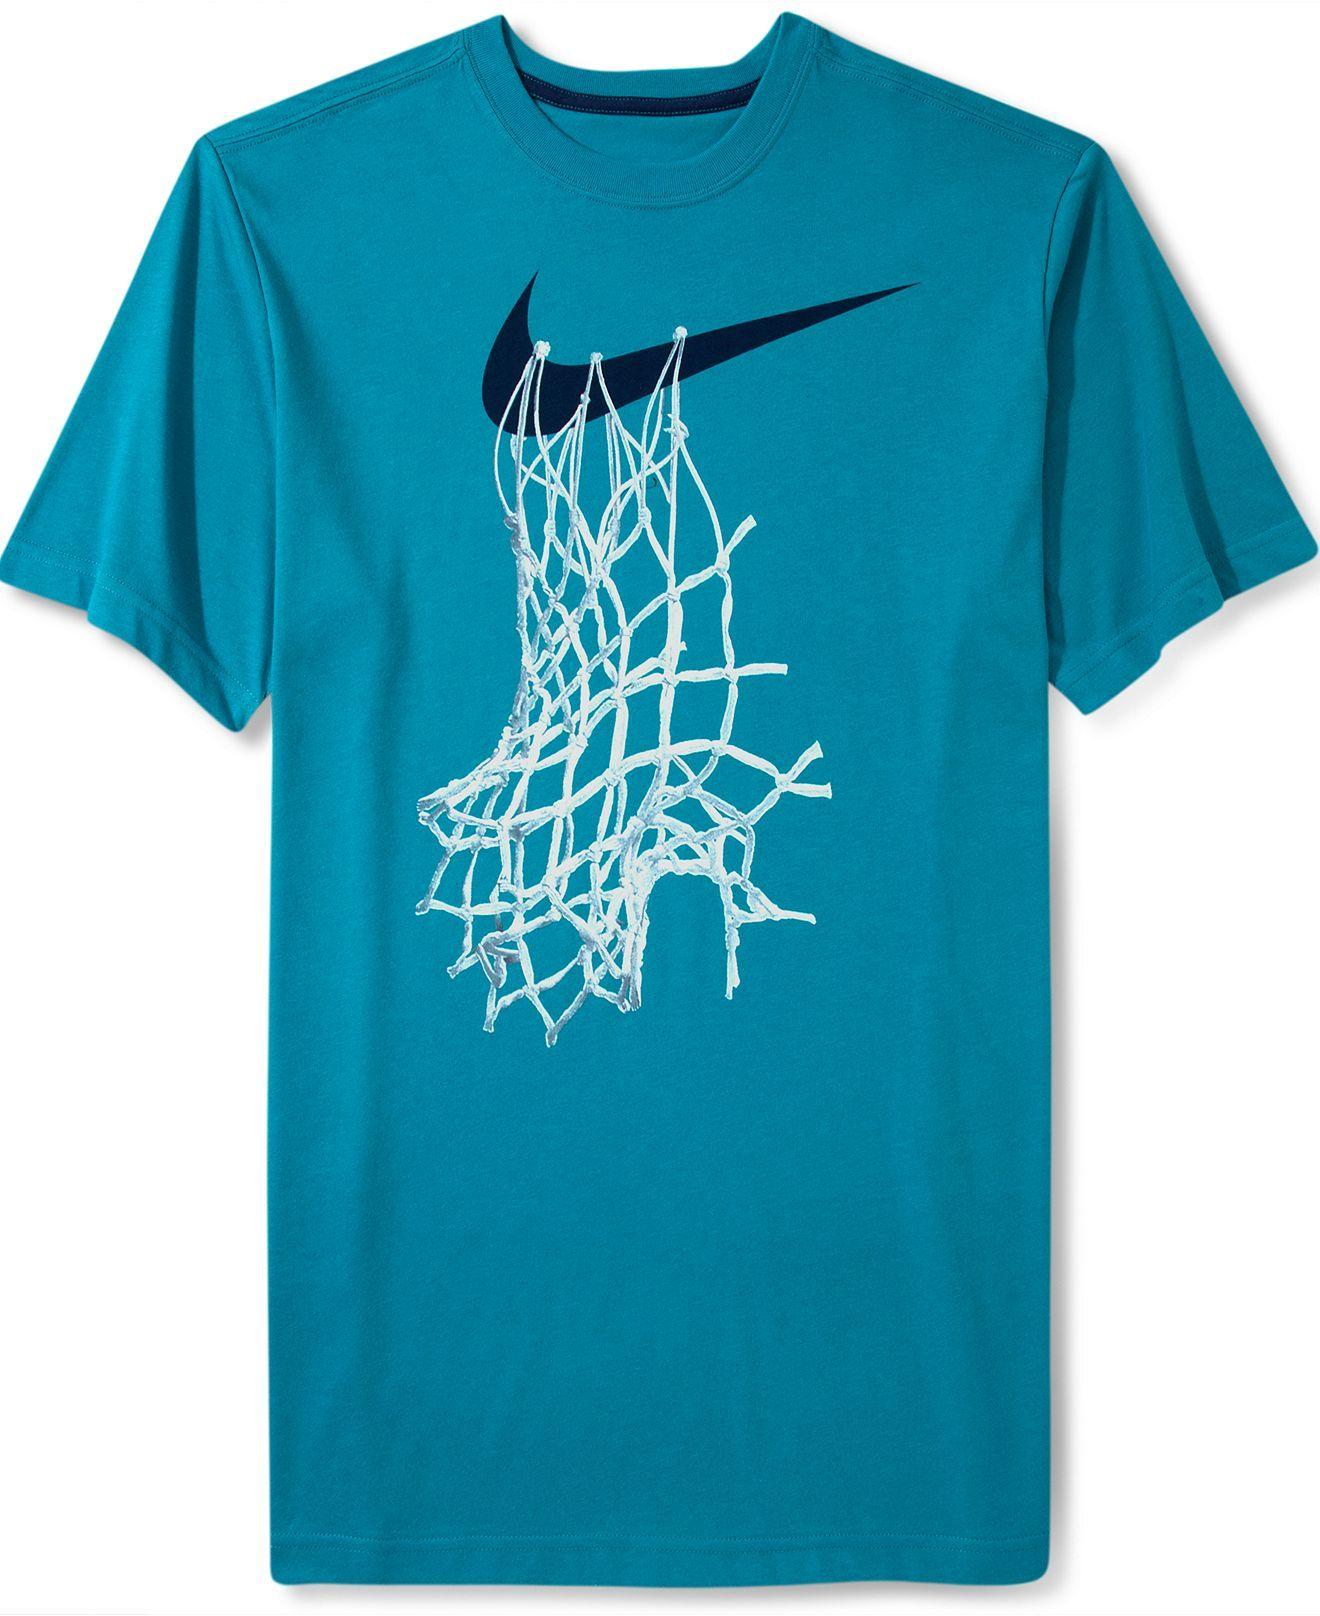 Nike t shirts design